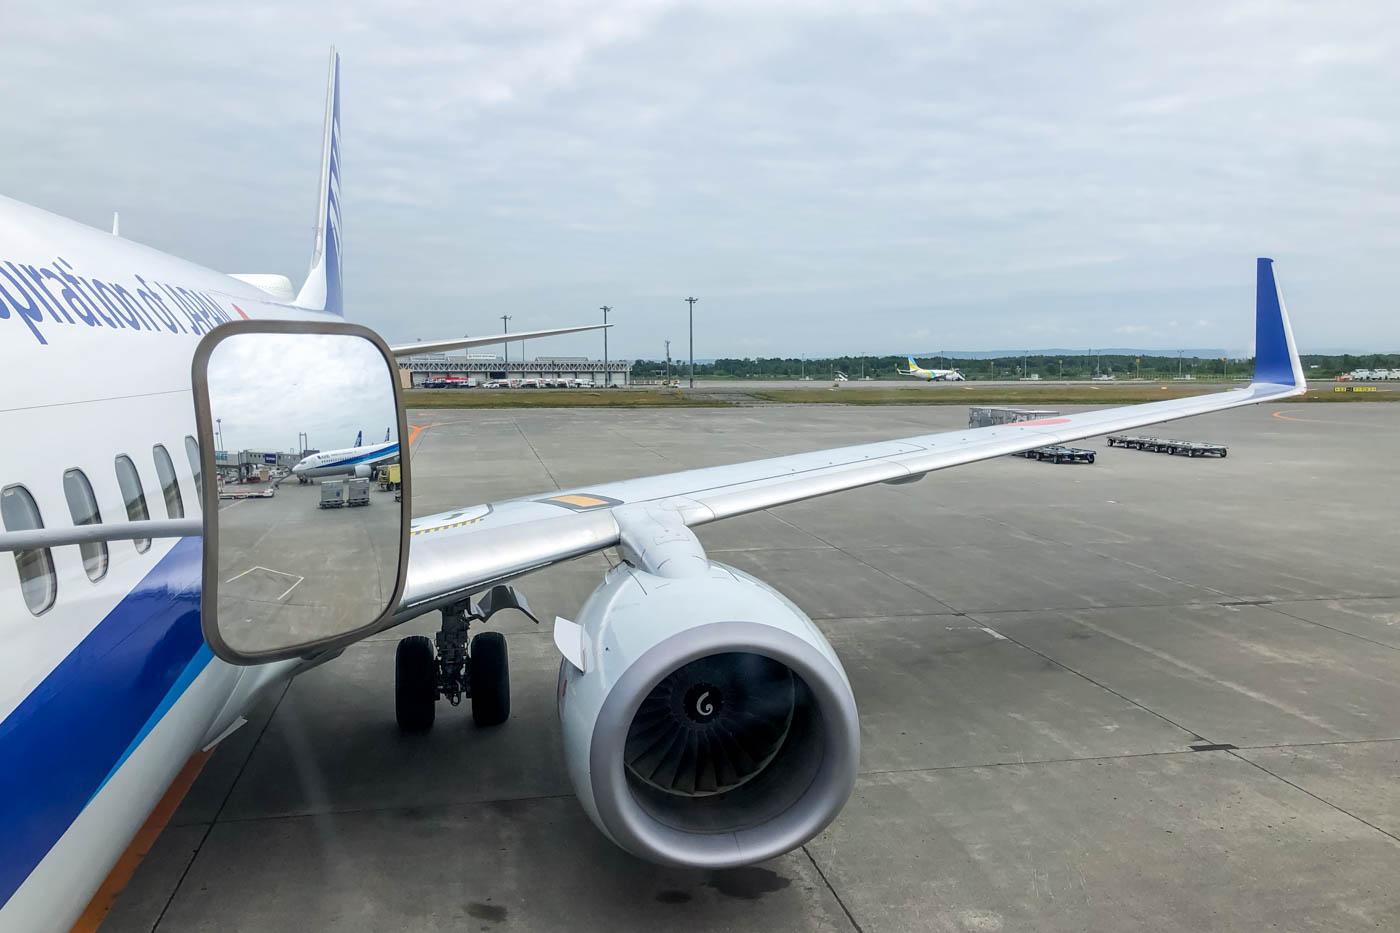 Boarding ANA 737-800